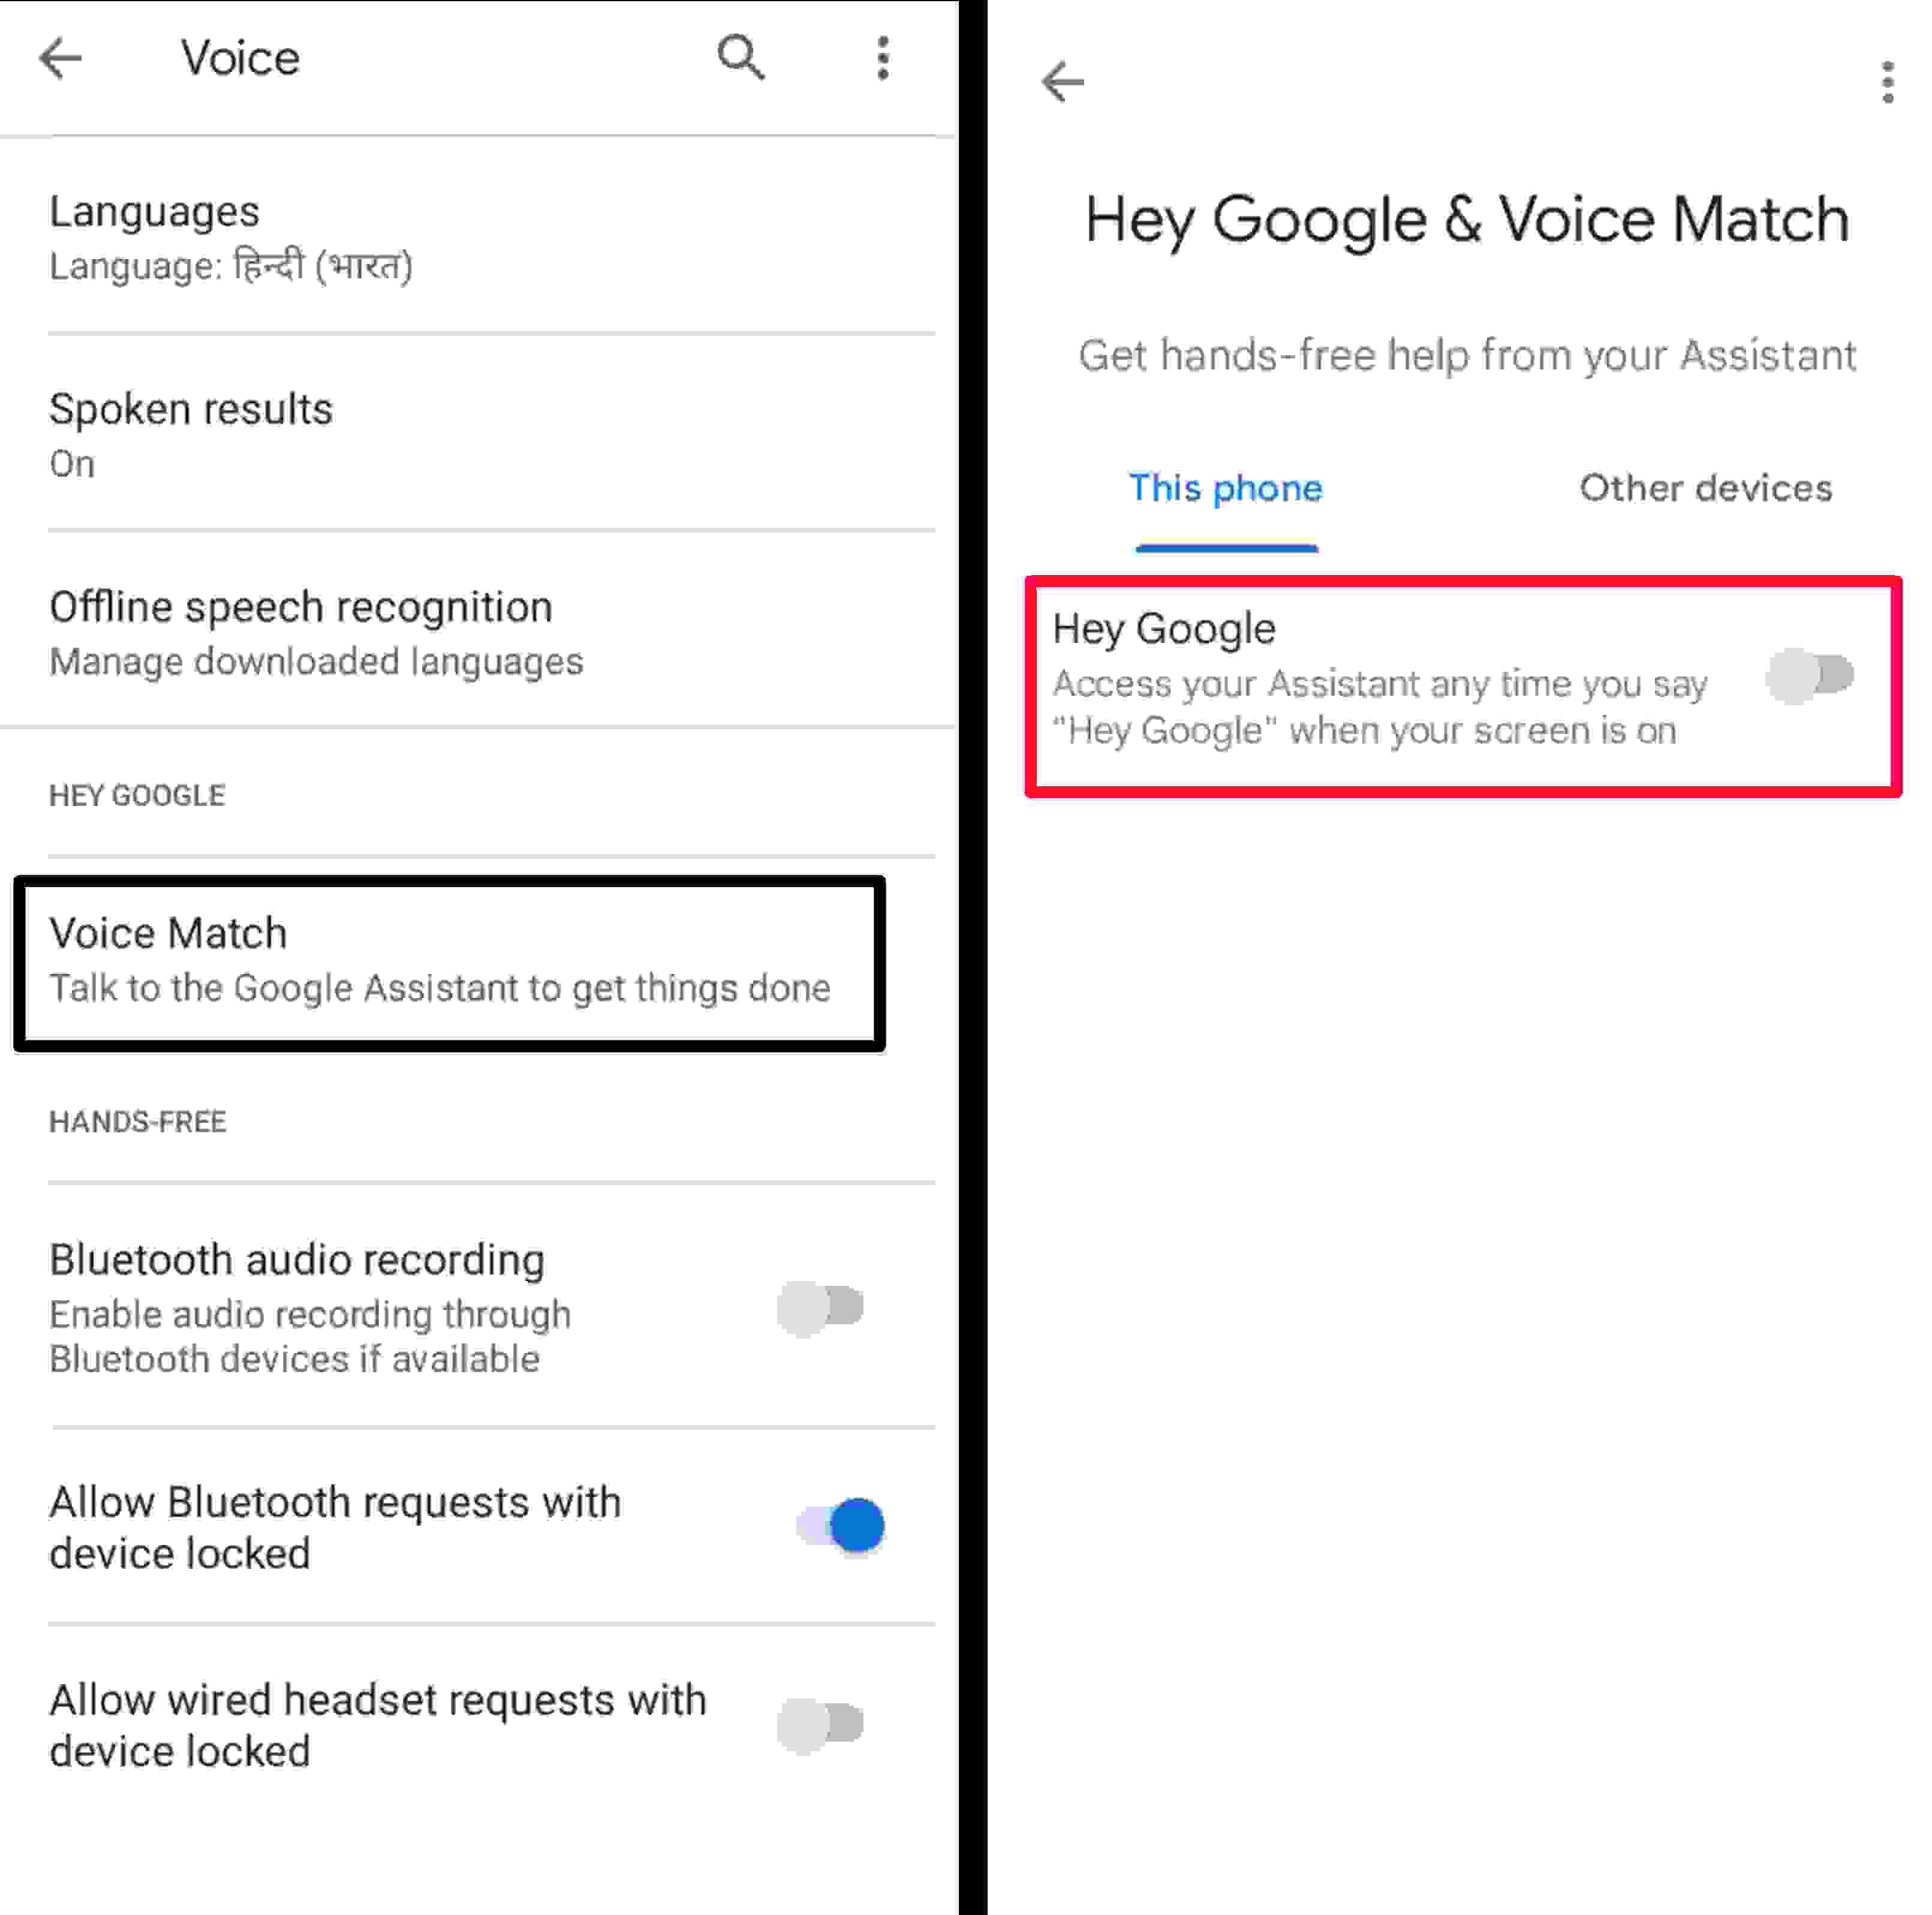 गूगल कैसे चालू करें | Google Kaise Chalu Kare STEP 3